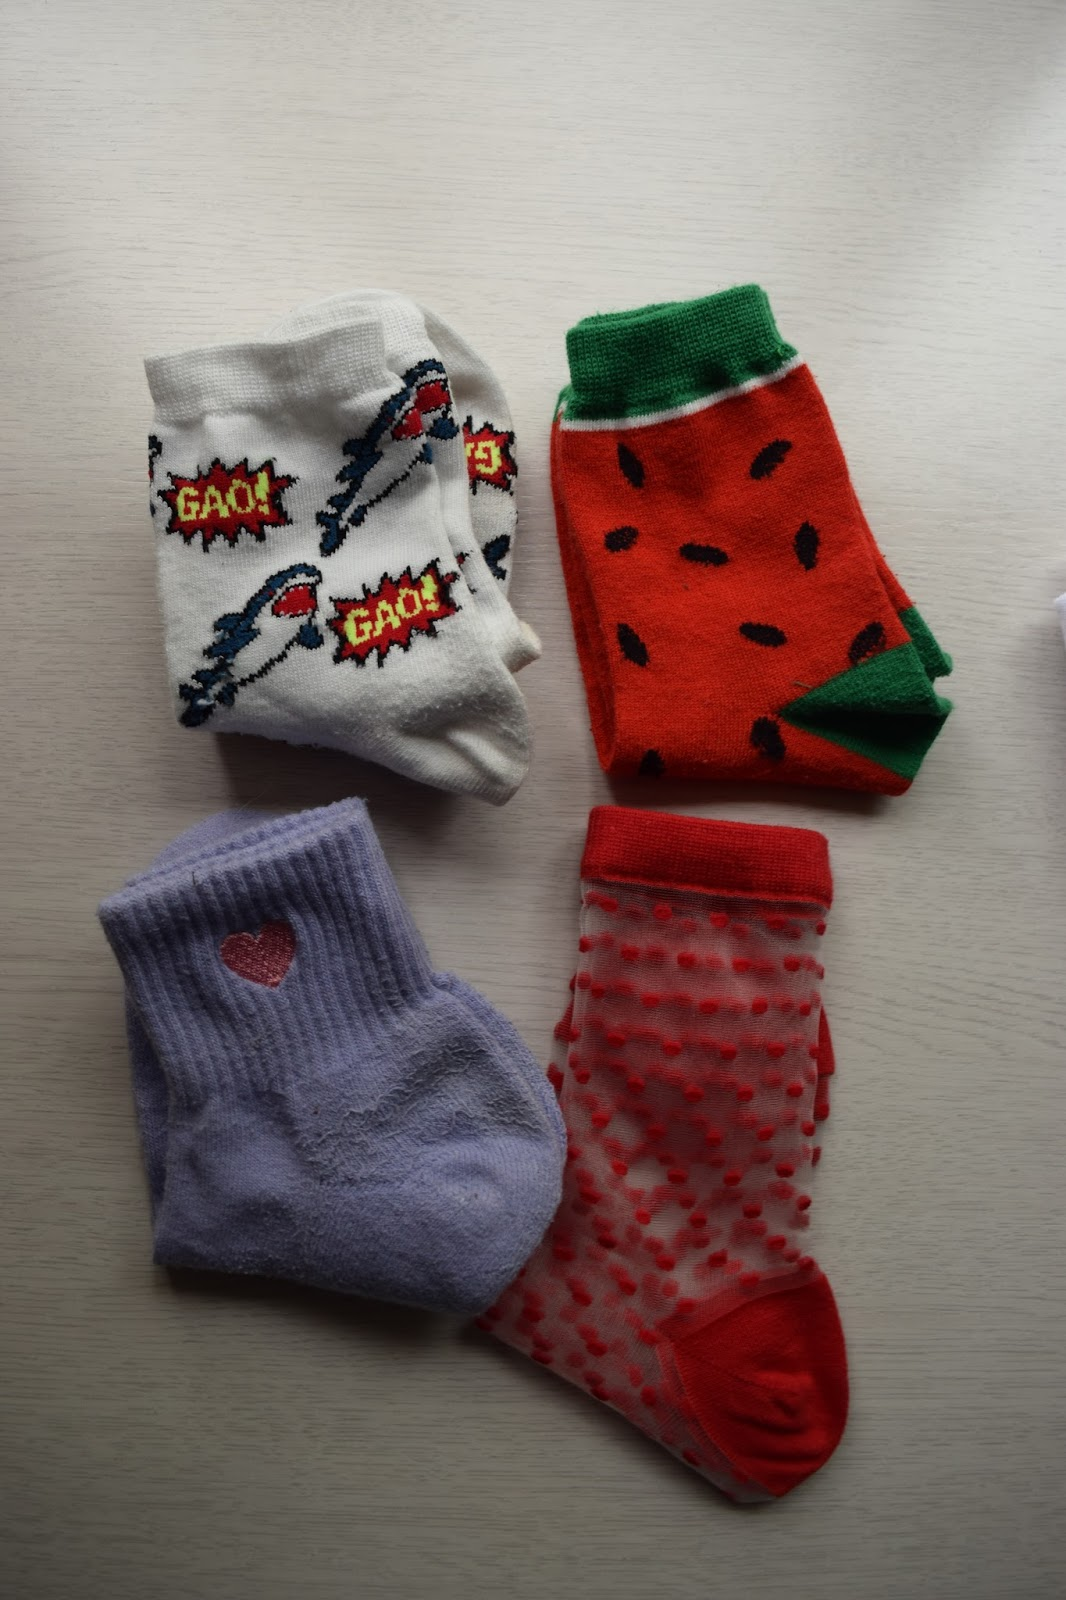 WEGO socks haul